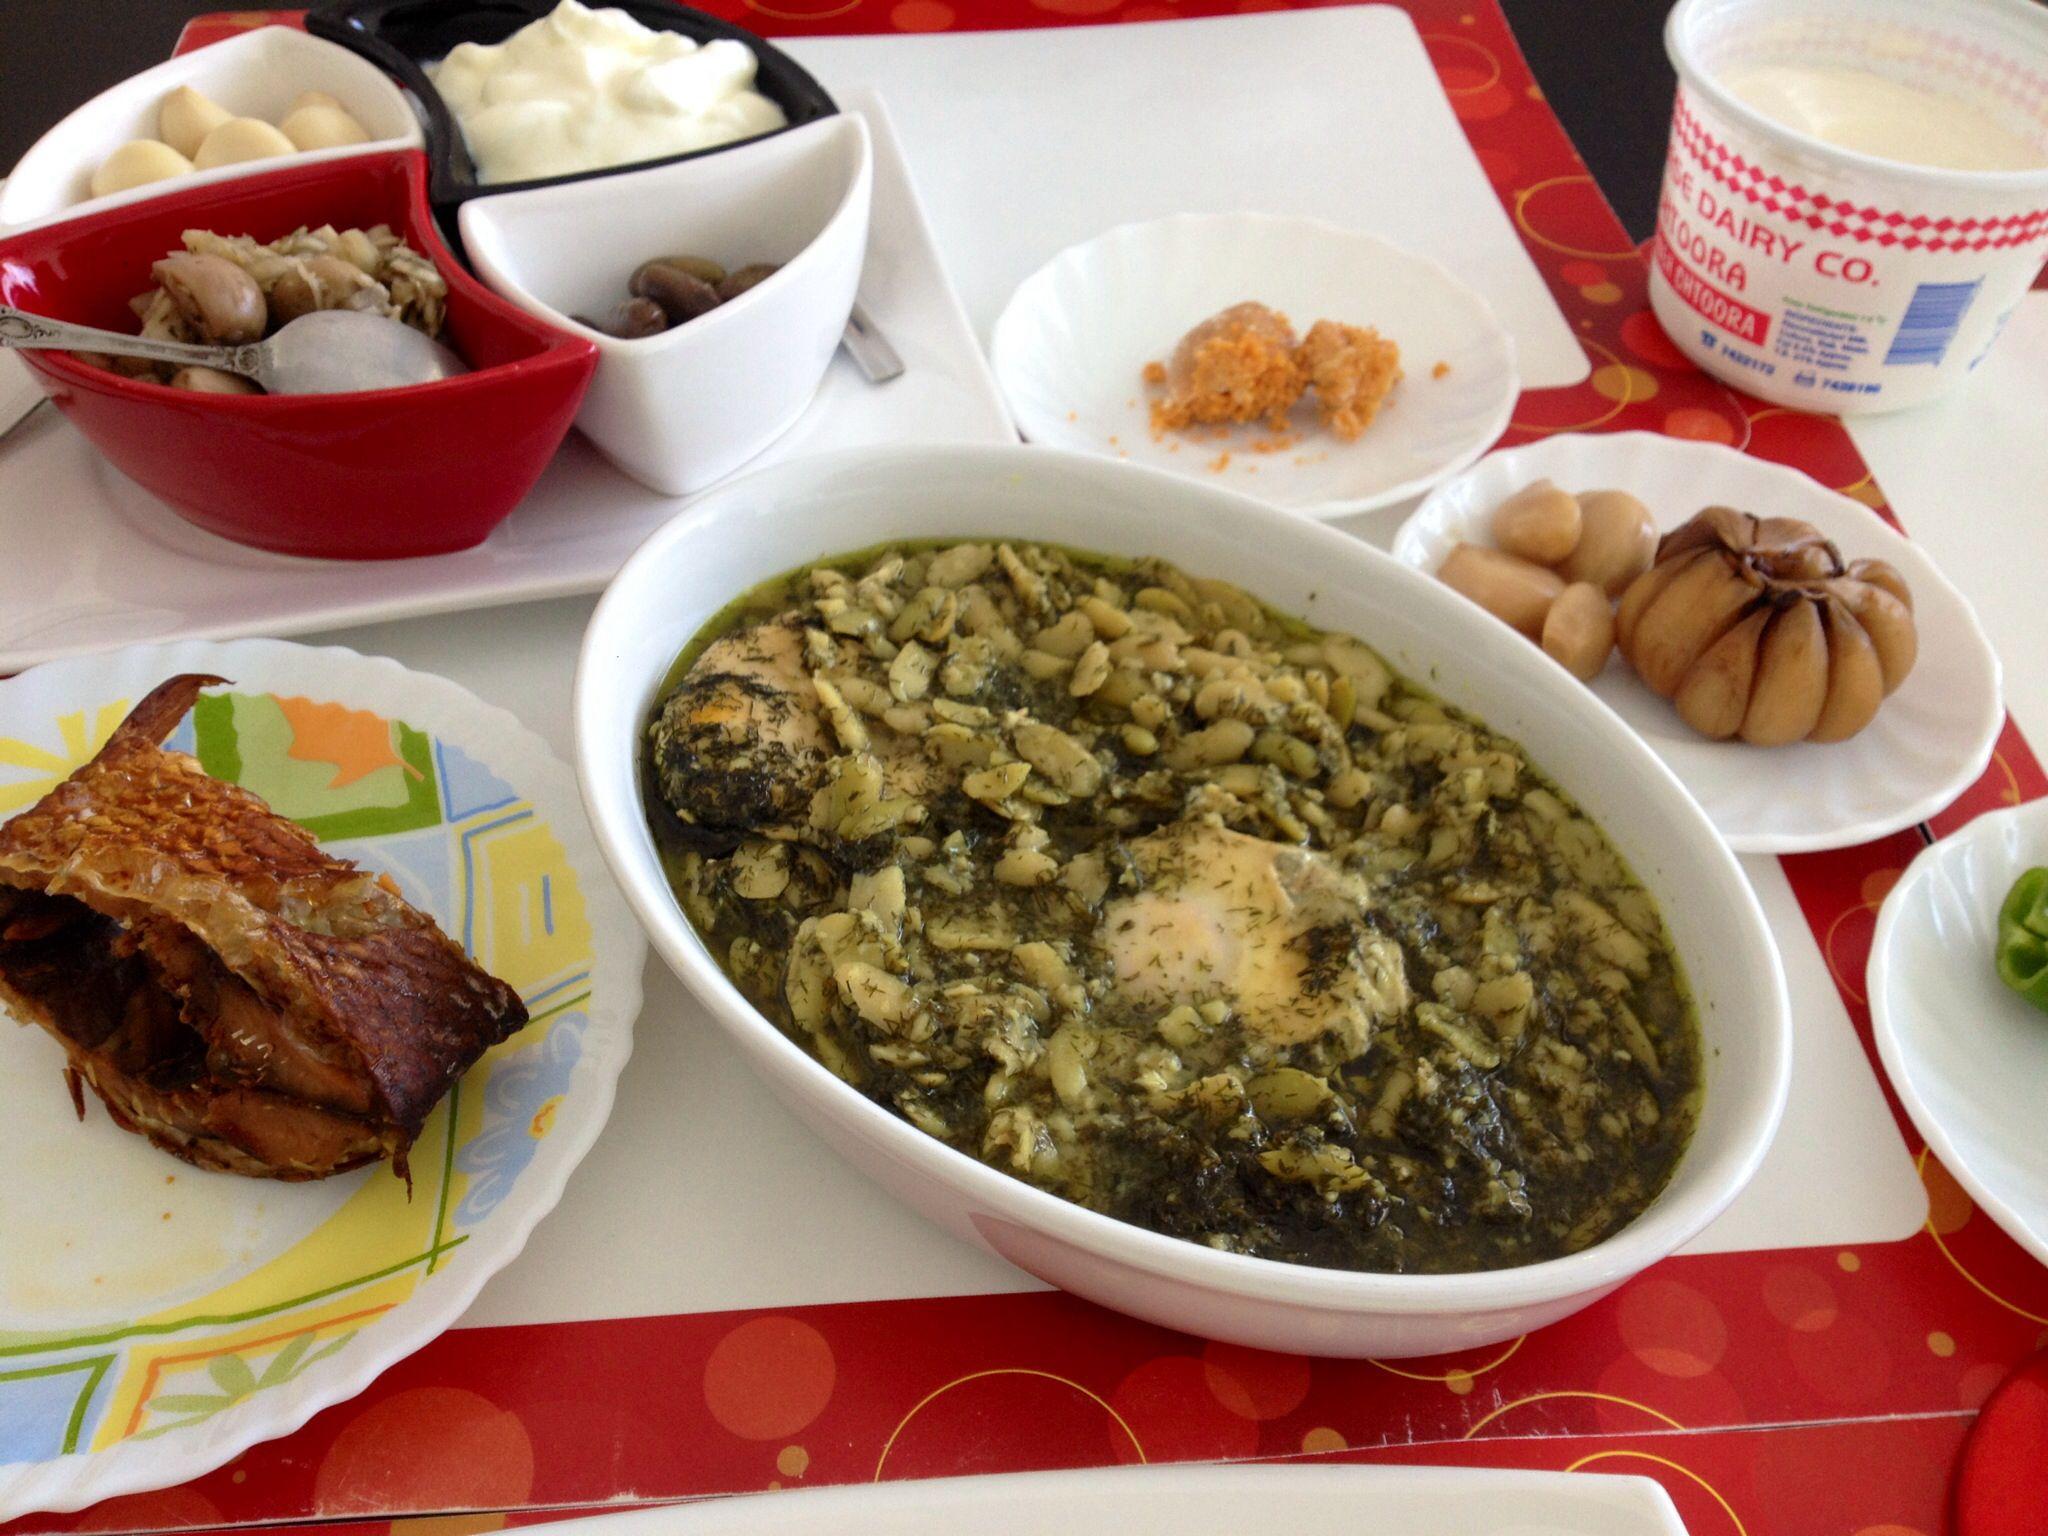 iranian food با ماهي دودي و اشپيل ماهي